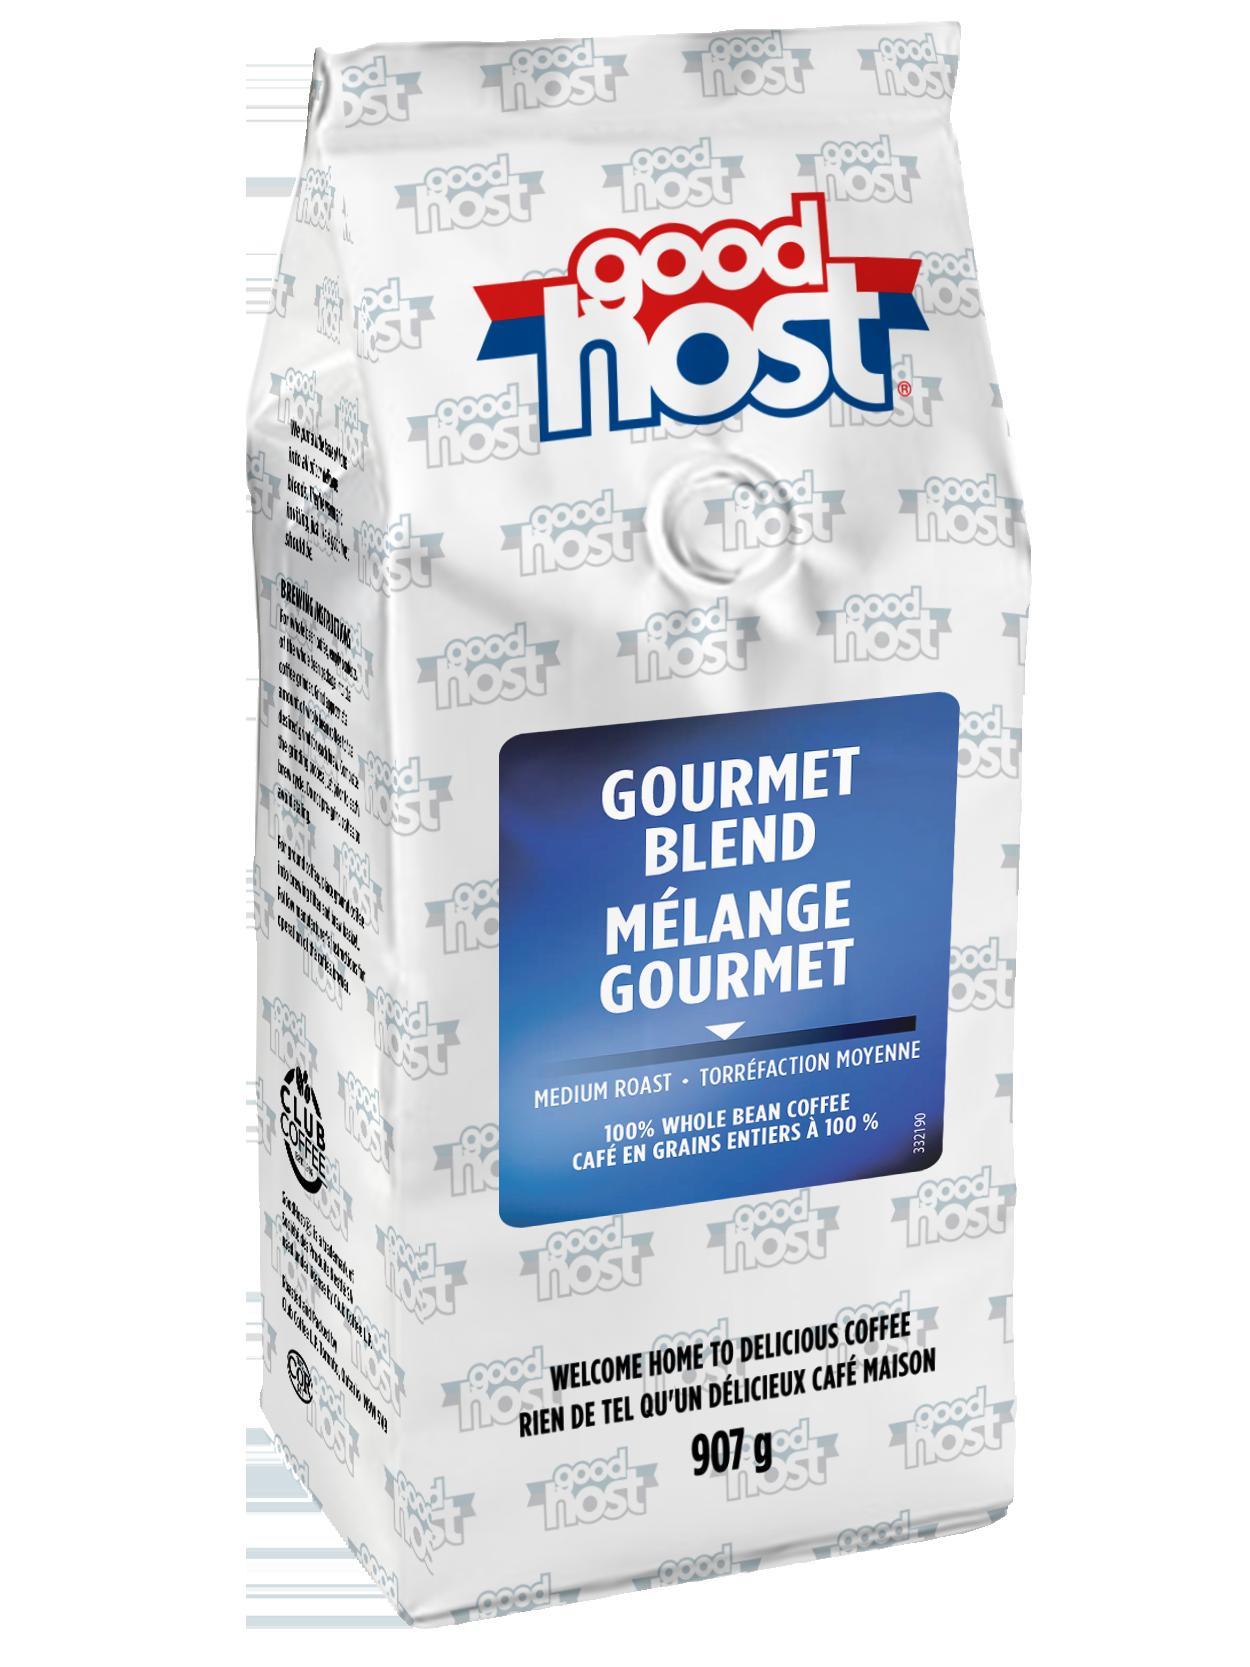 GoodHost Gourmet Blend Whole Bean Coffee 2Lb Bag